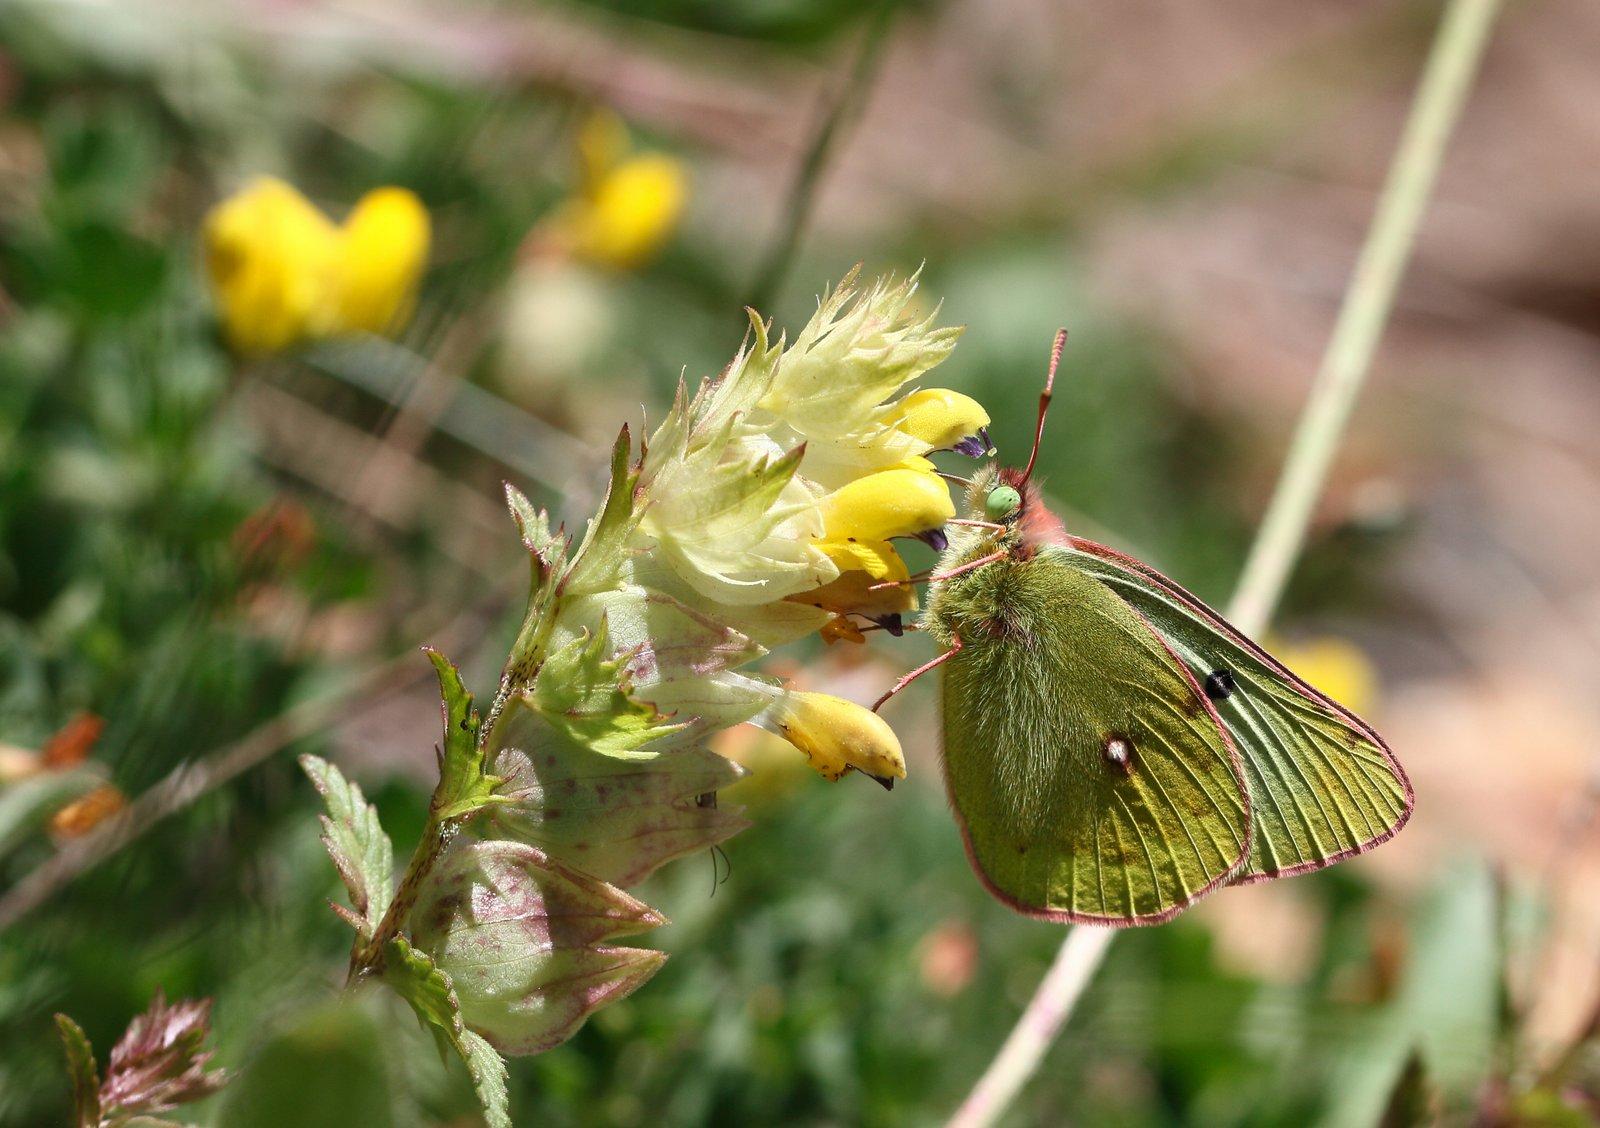 Bjerghøsommerfugl, Colias phicomone